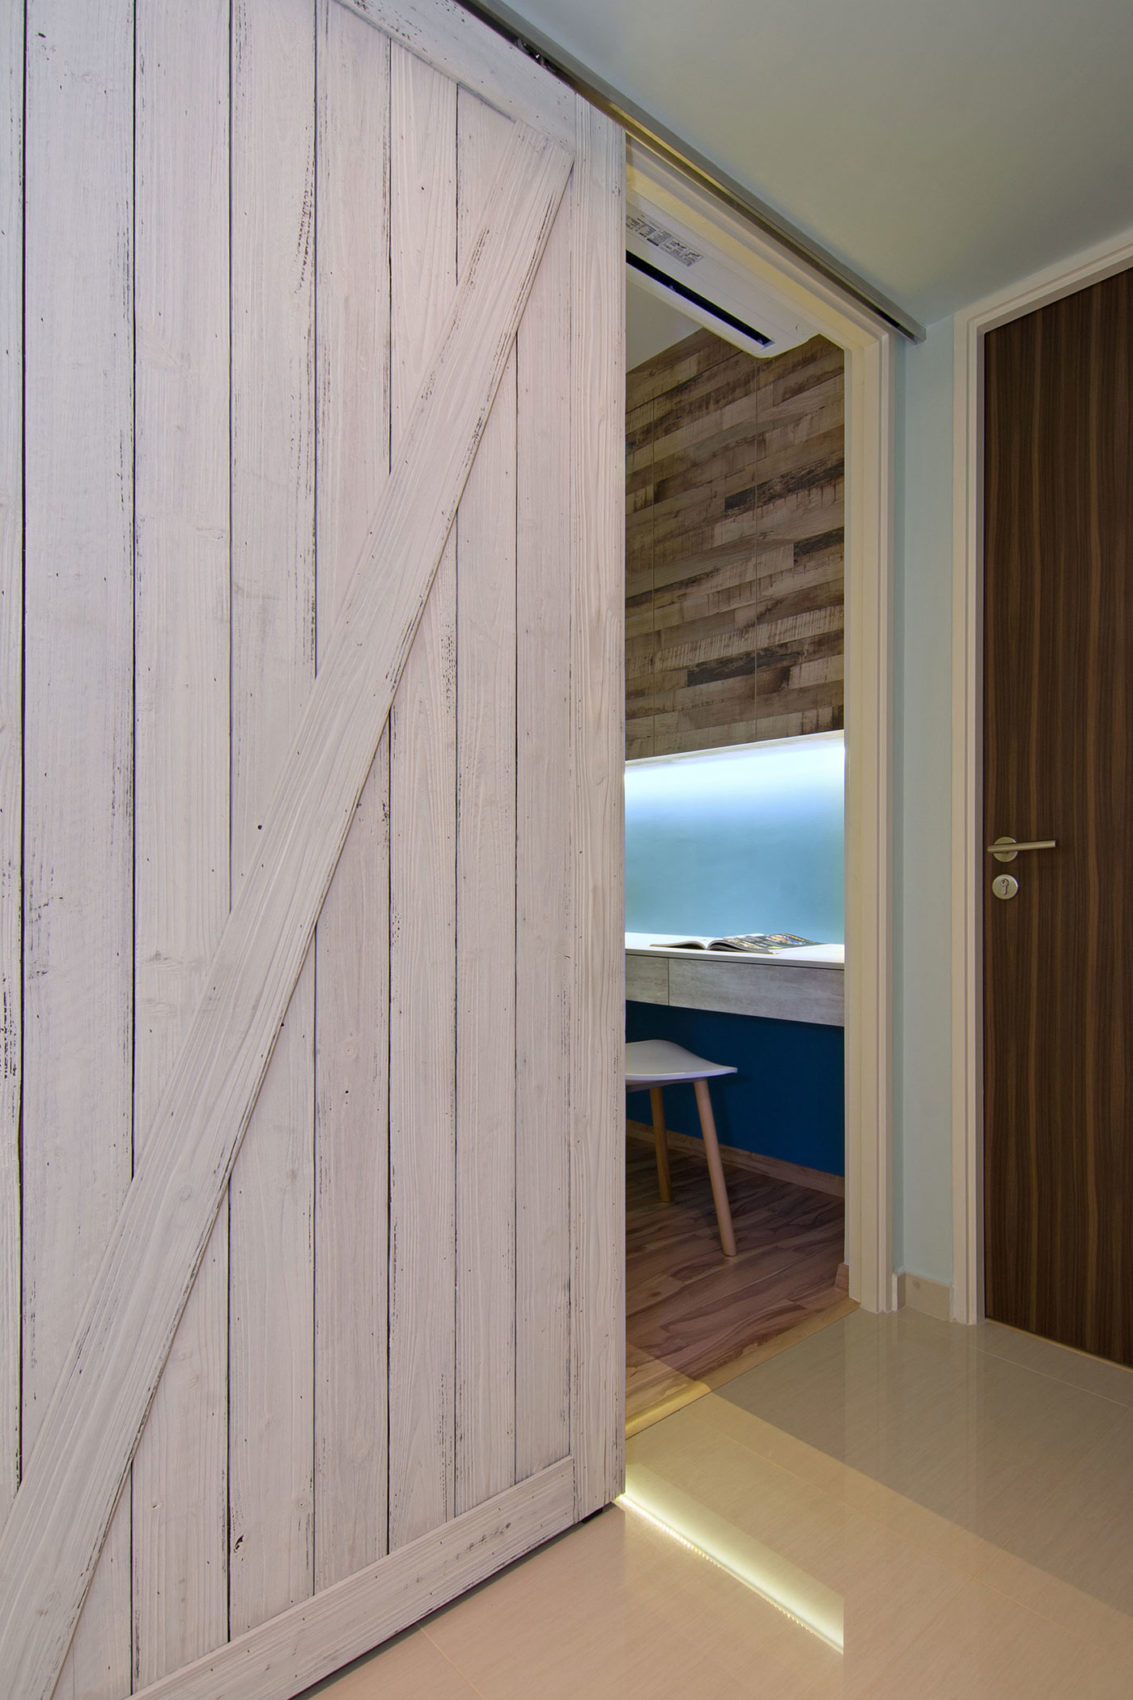 Beach House by Vievva Designers (14)